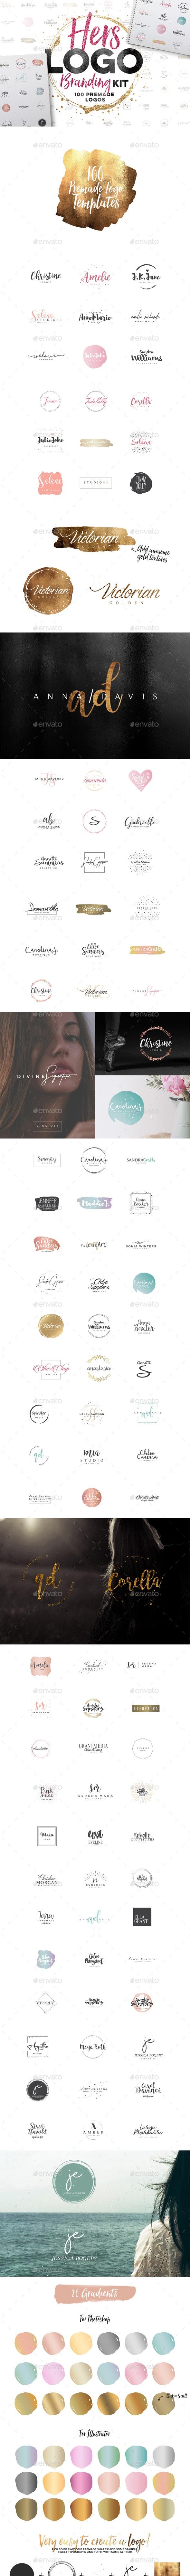 Hers Logo Branding Kit - Badges & Stickers Web Elements